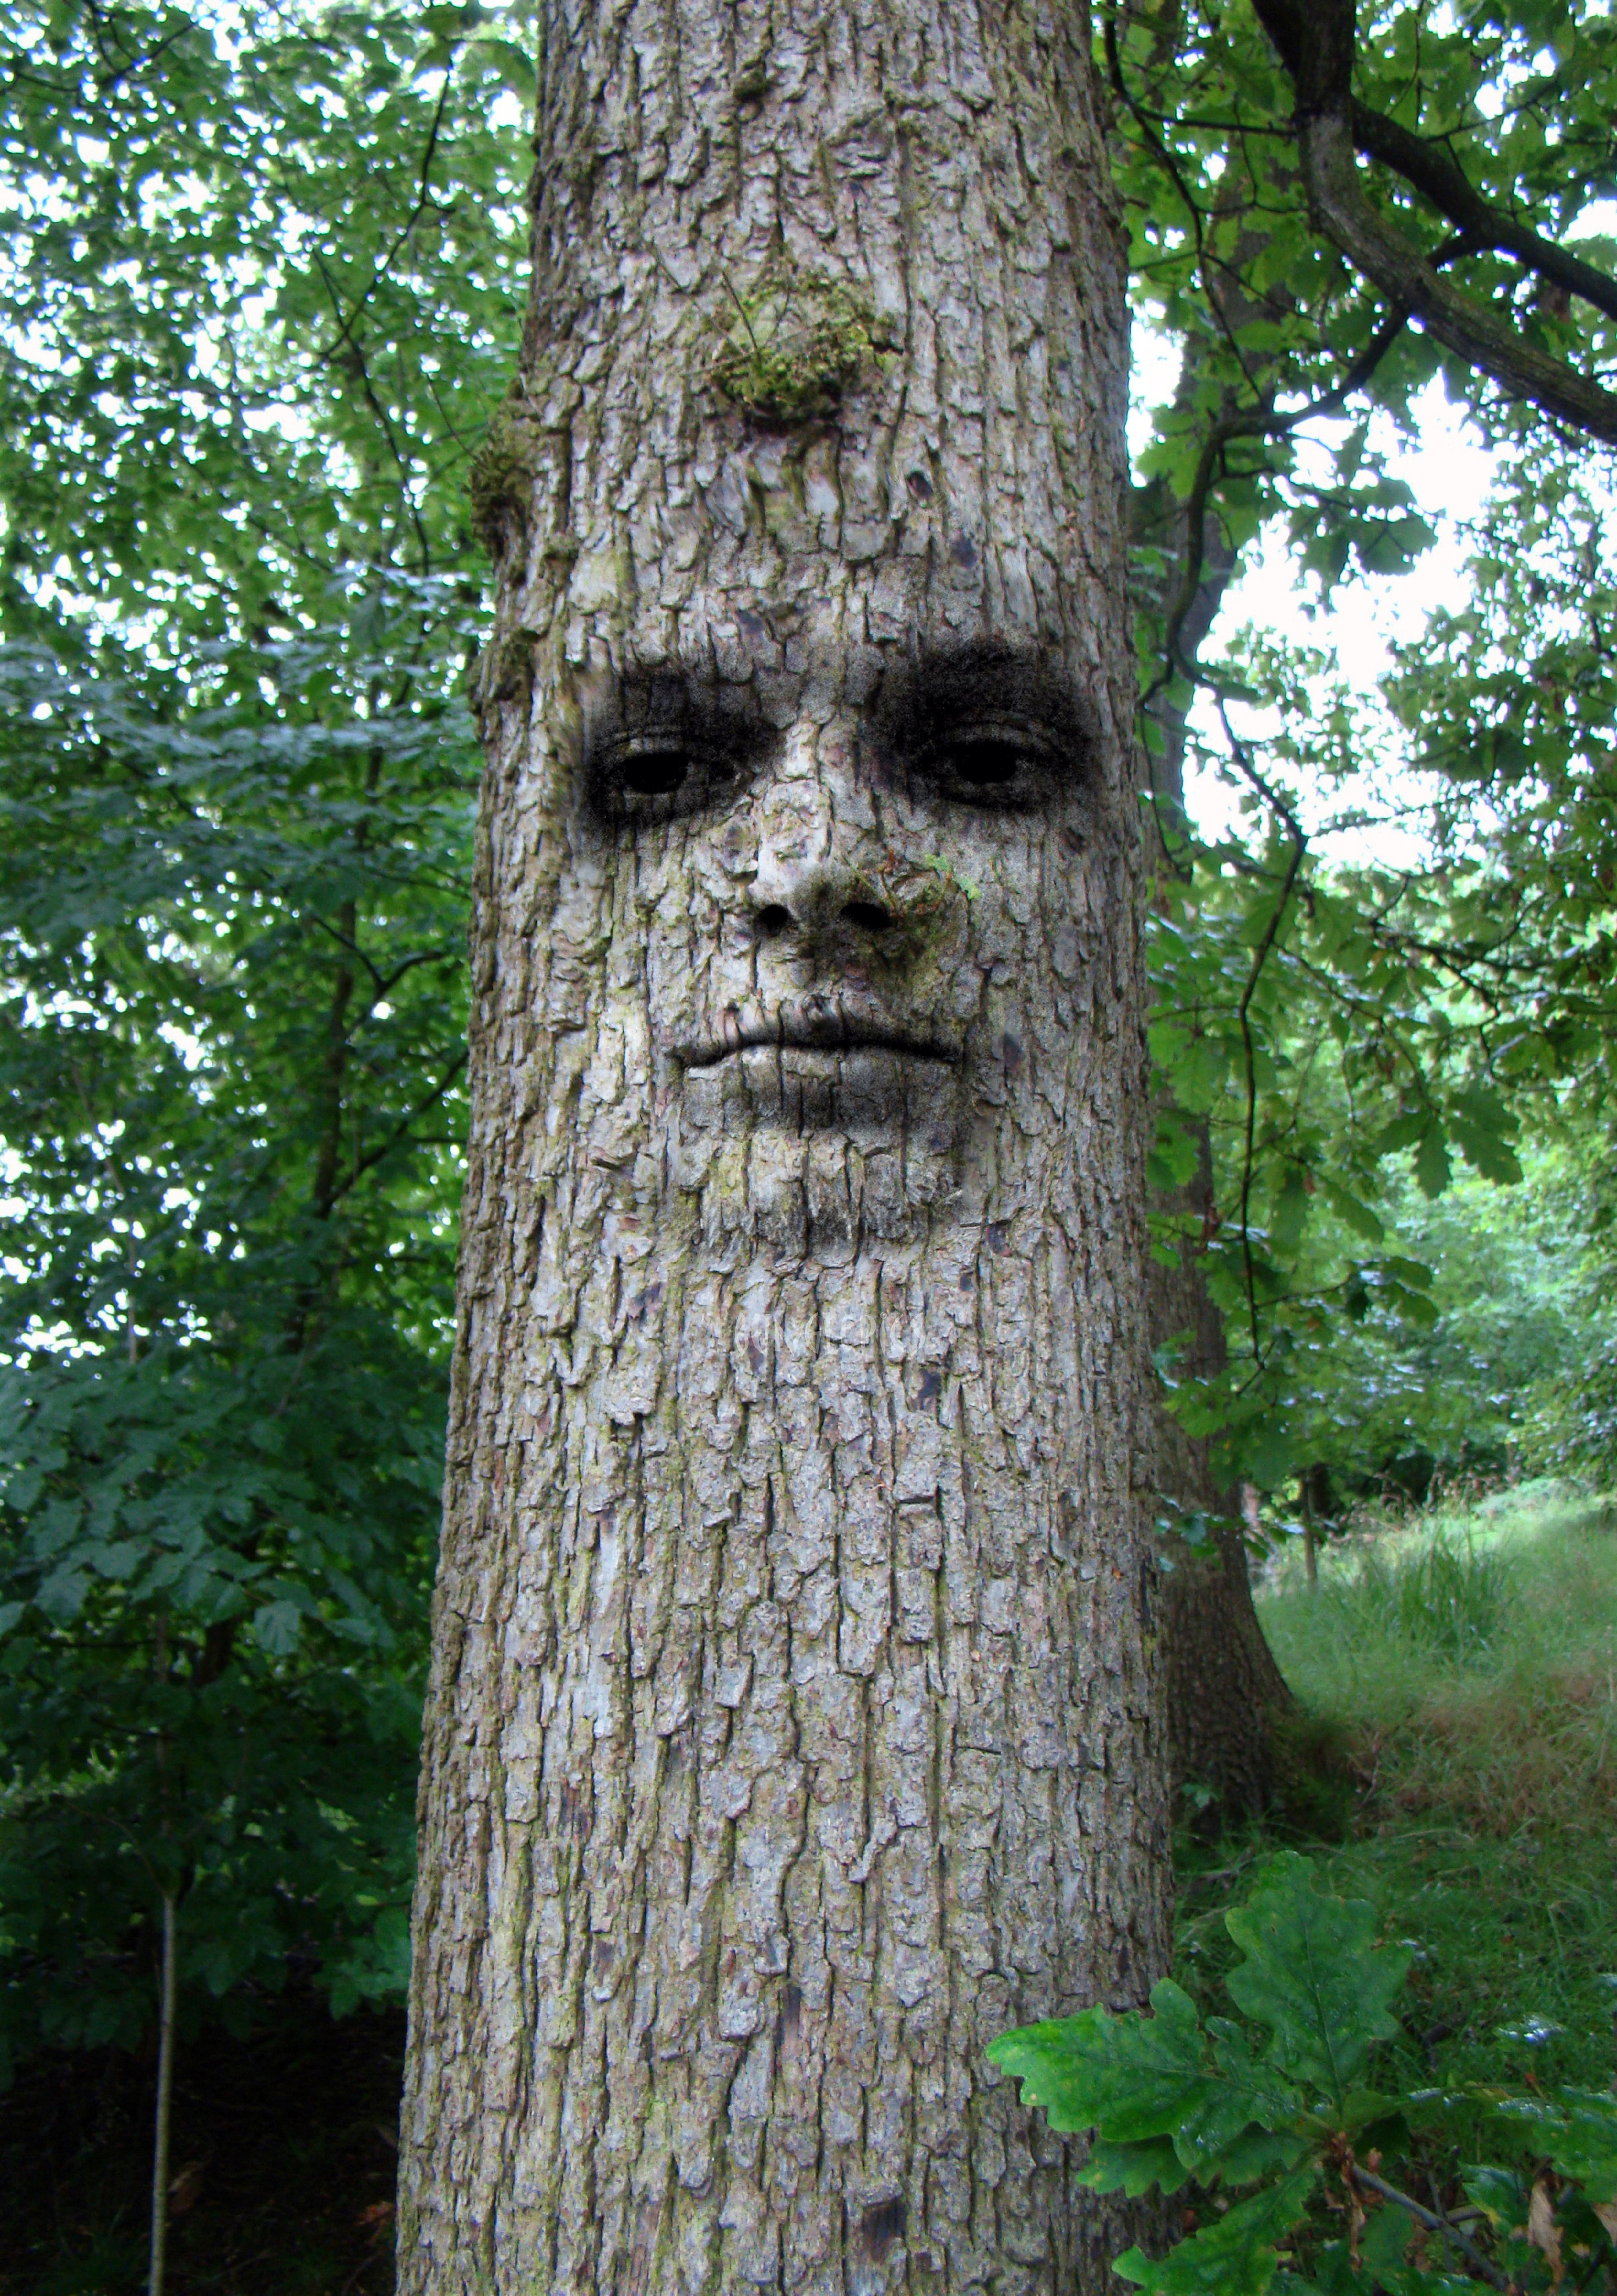 Birch Tree Trunk Decor